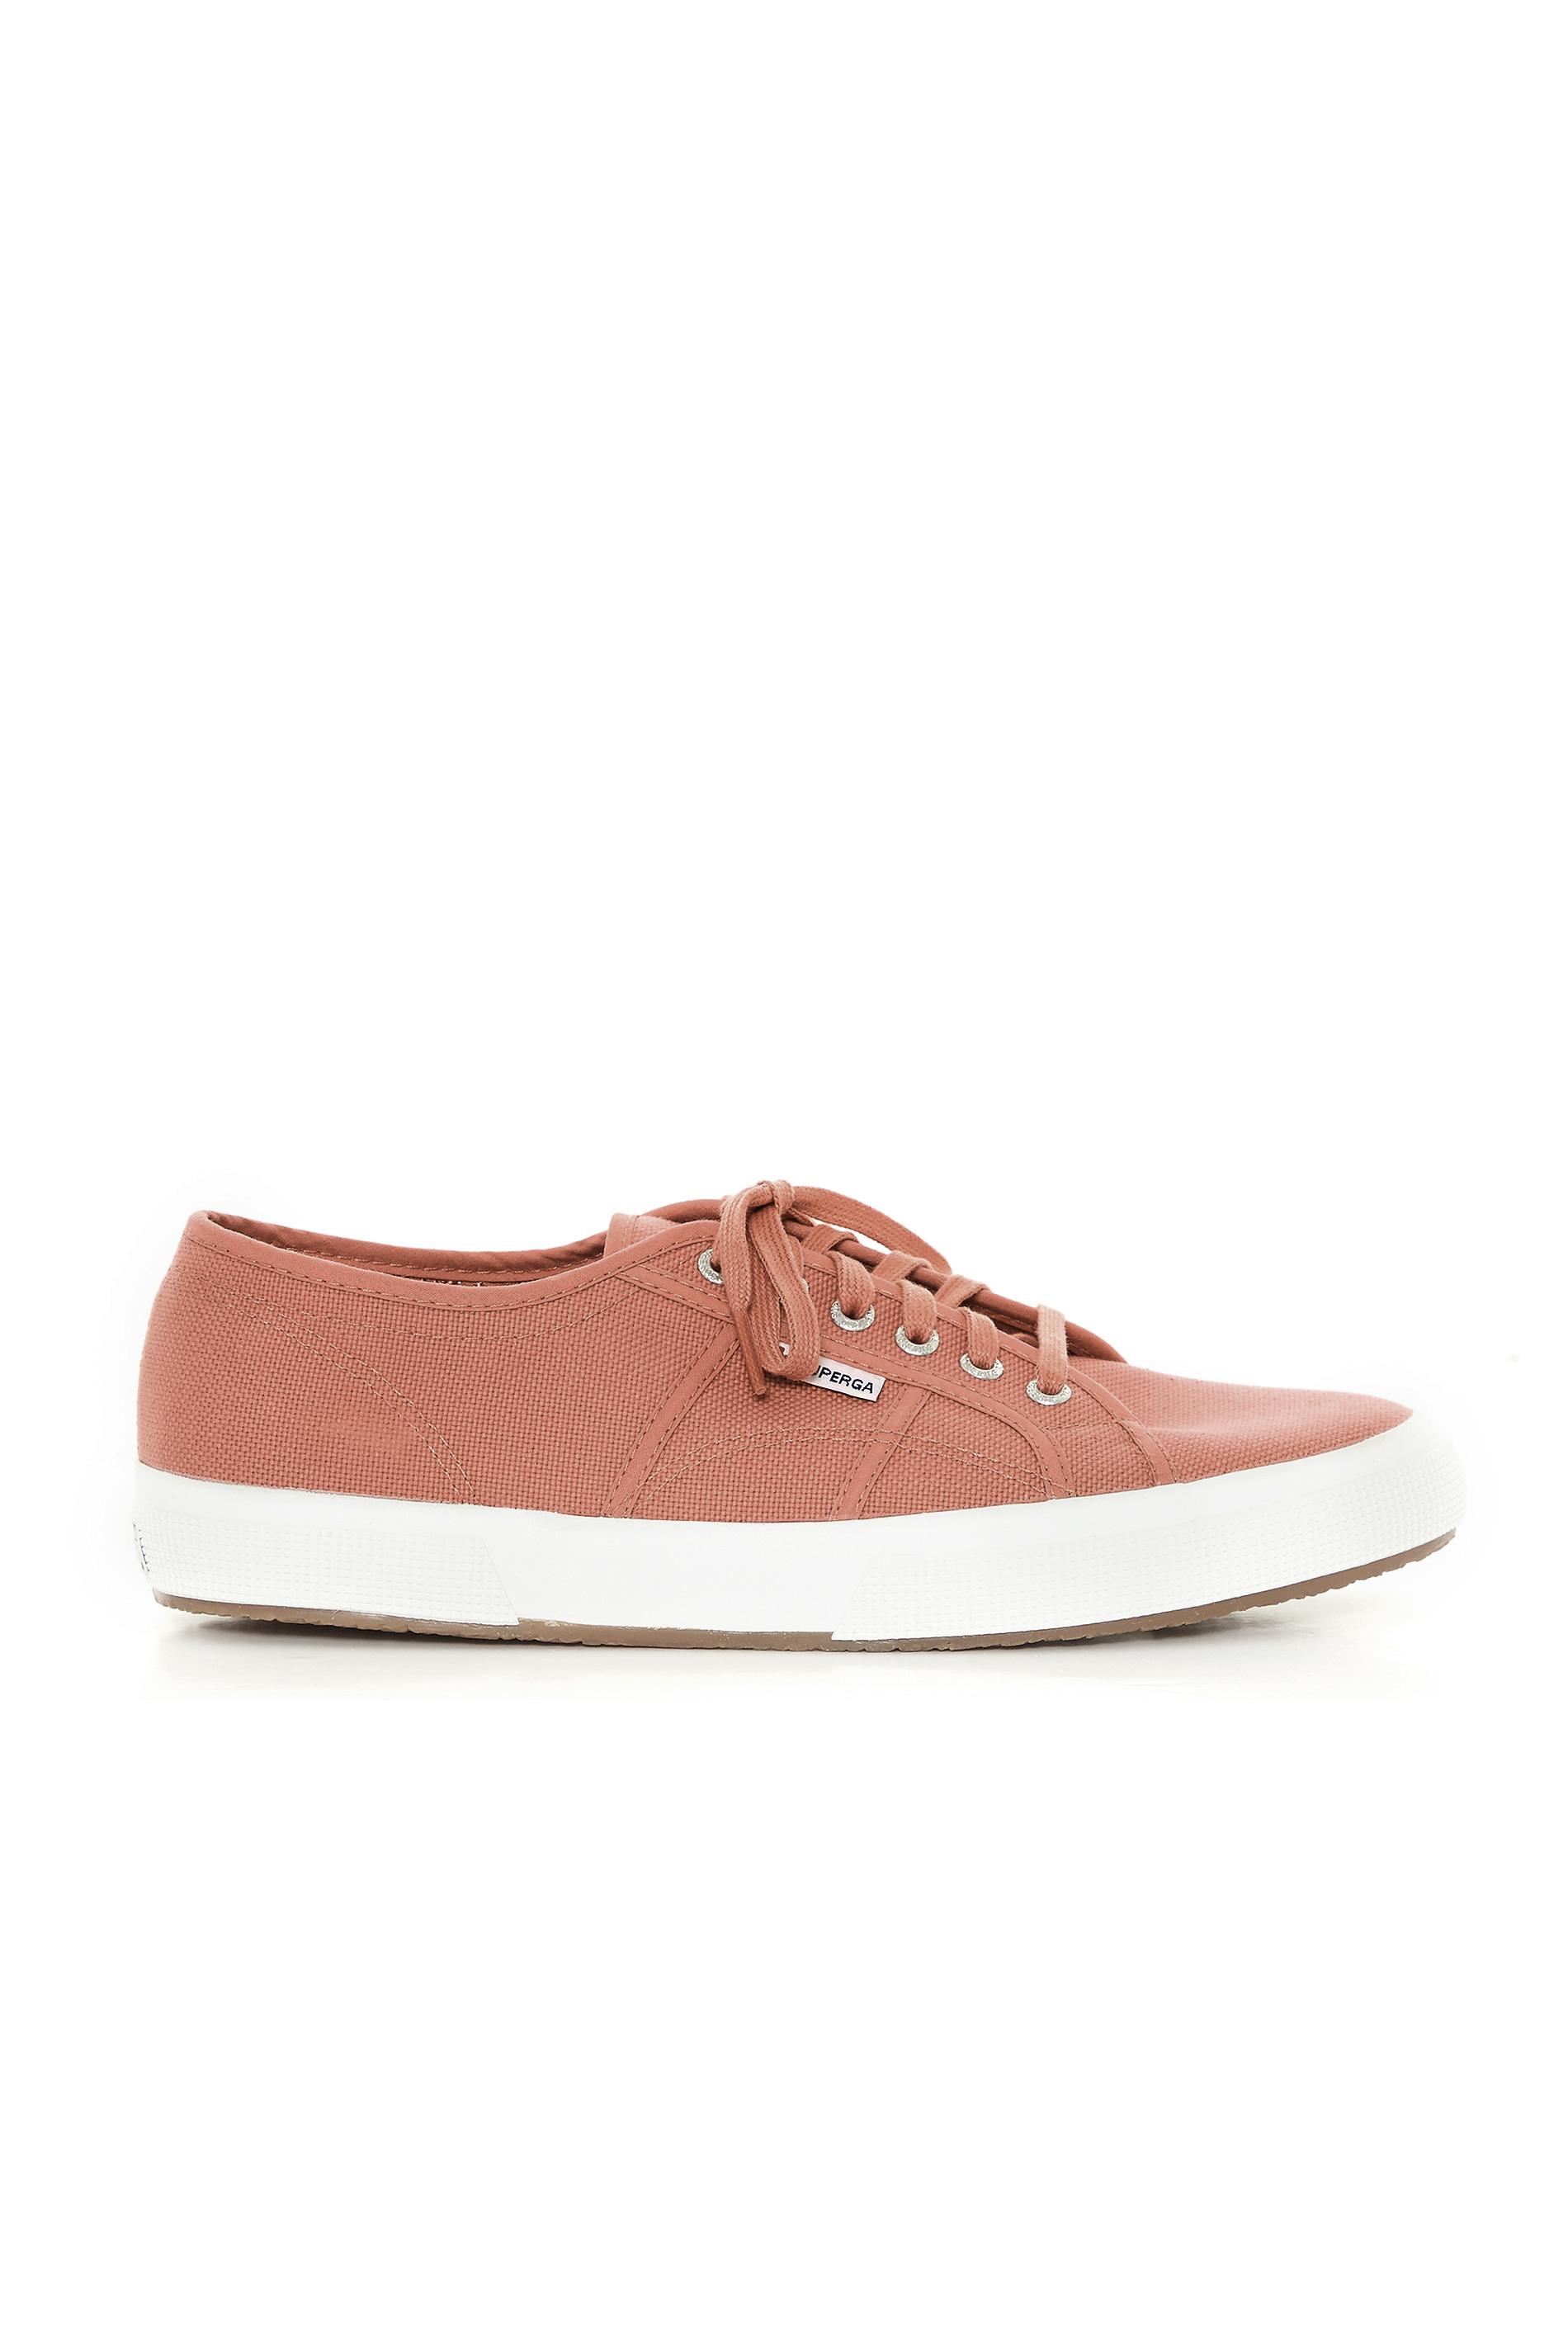 SUPERGA 2730 Pink Cotu Flatform